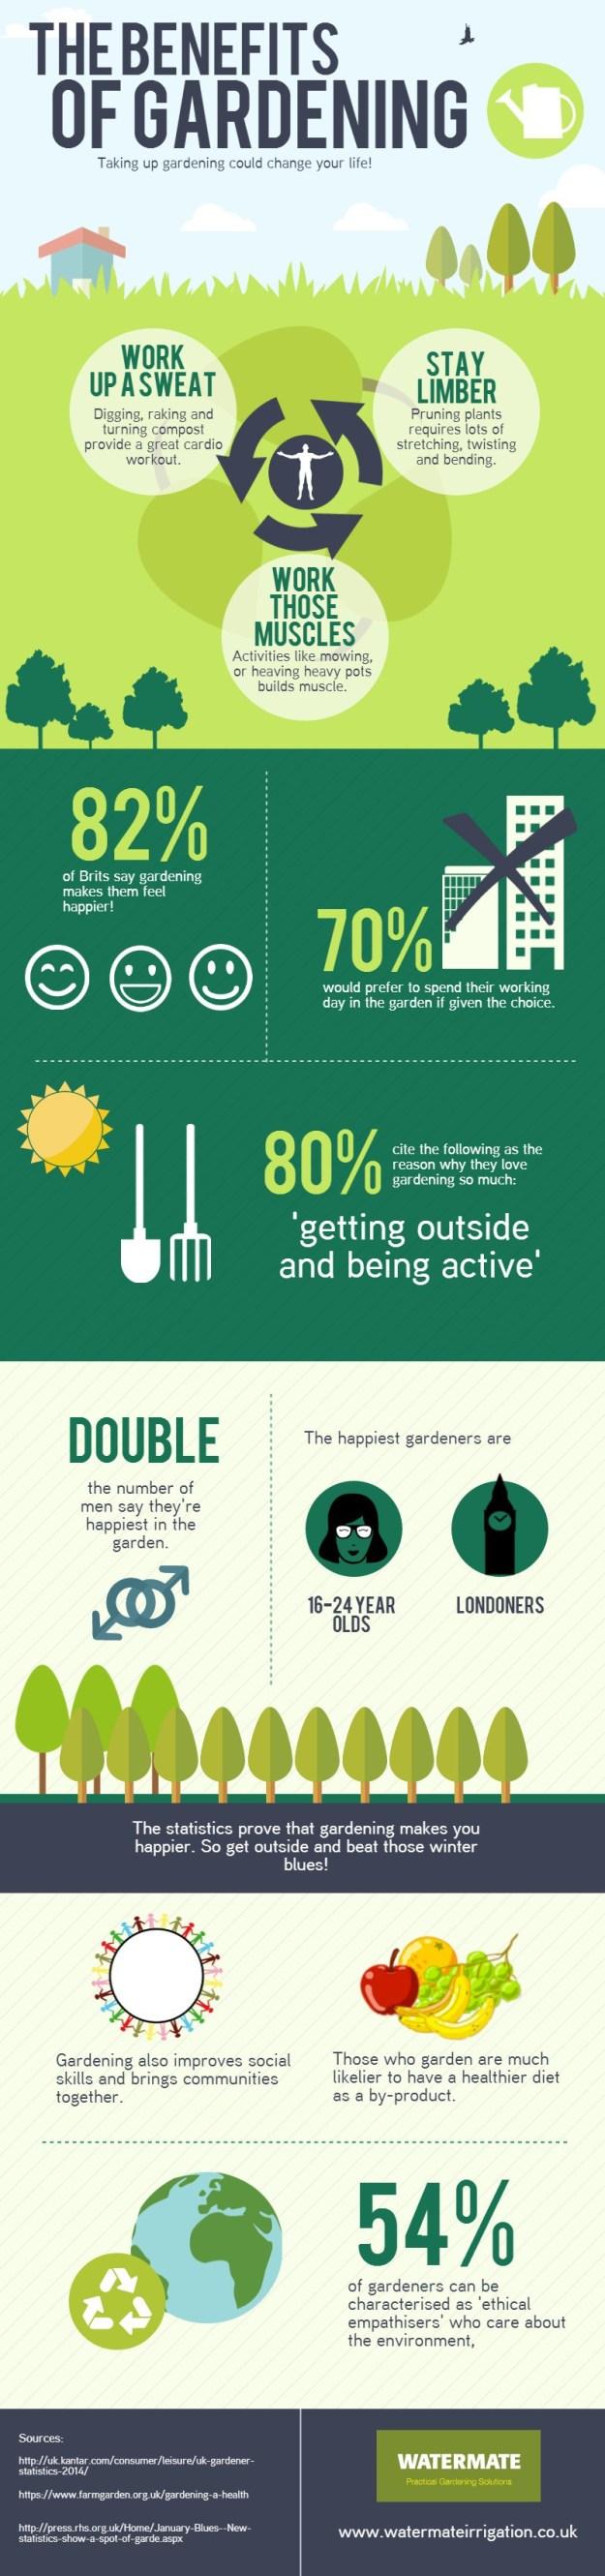 9 Winter Gardening Tips for Preppers